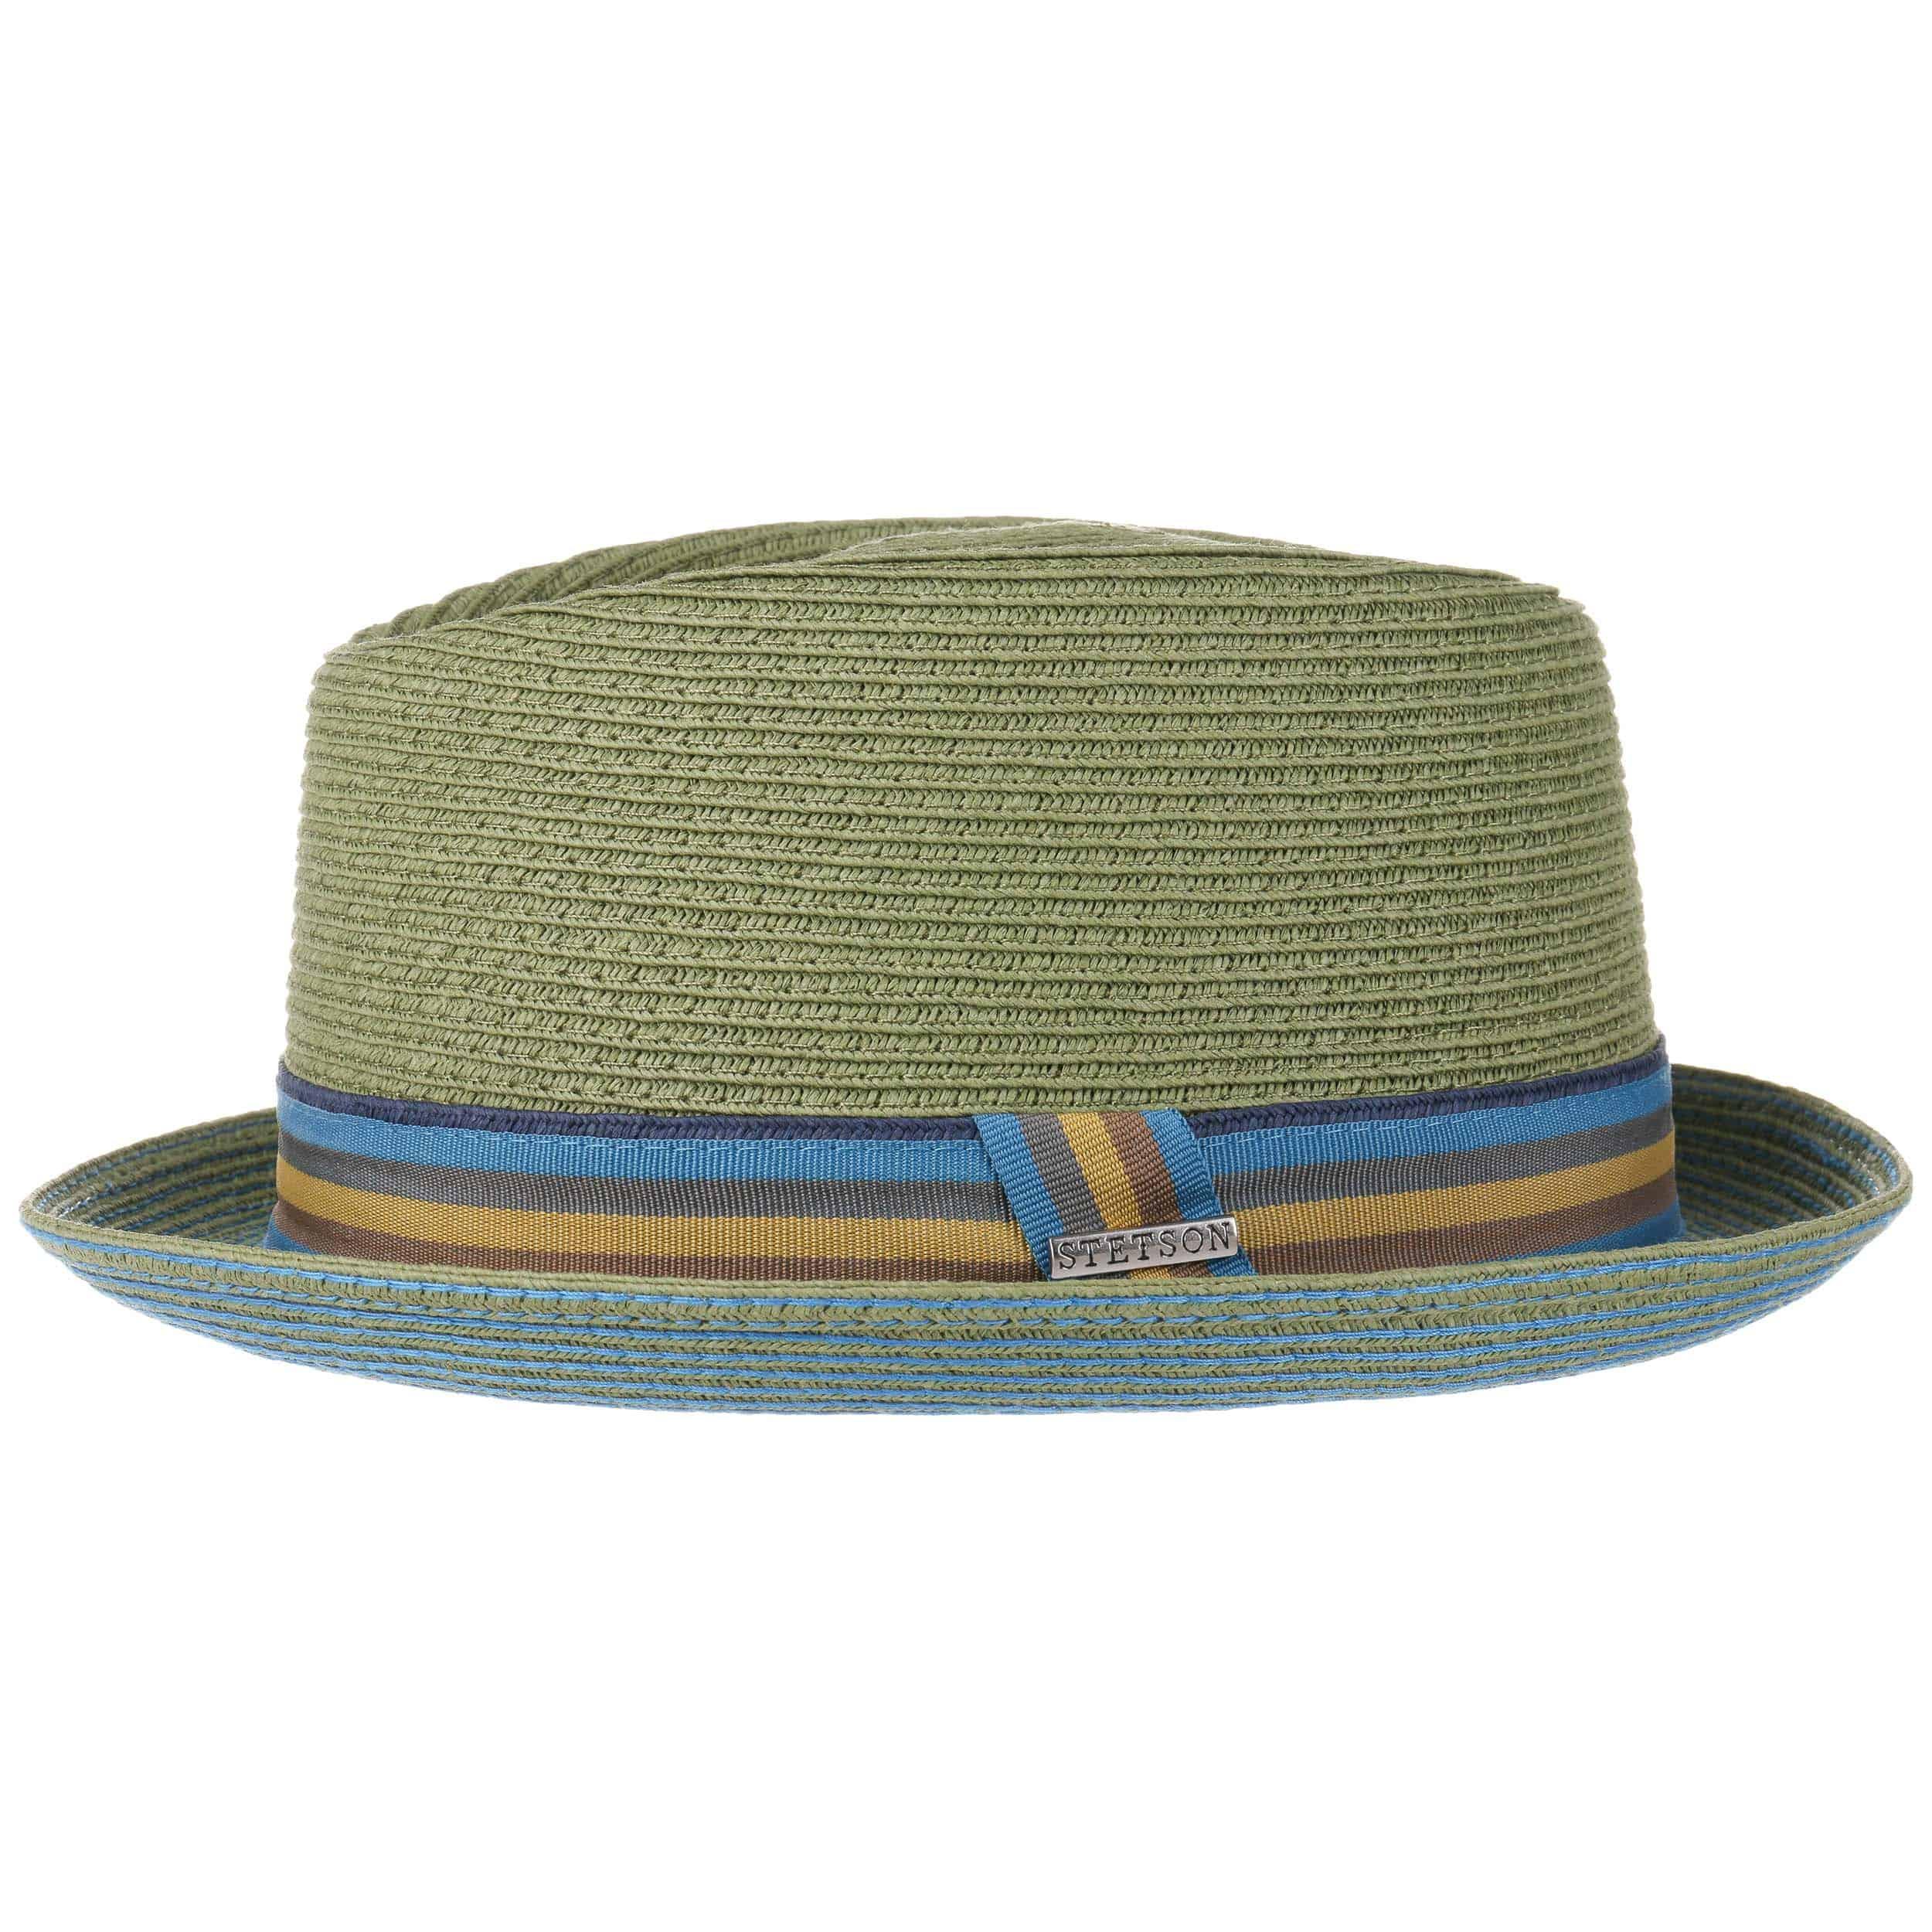 be4c0fd462e ... 4 · Contrast Stitch Toyo Diamond Hat by Stetson - green 1 ...